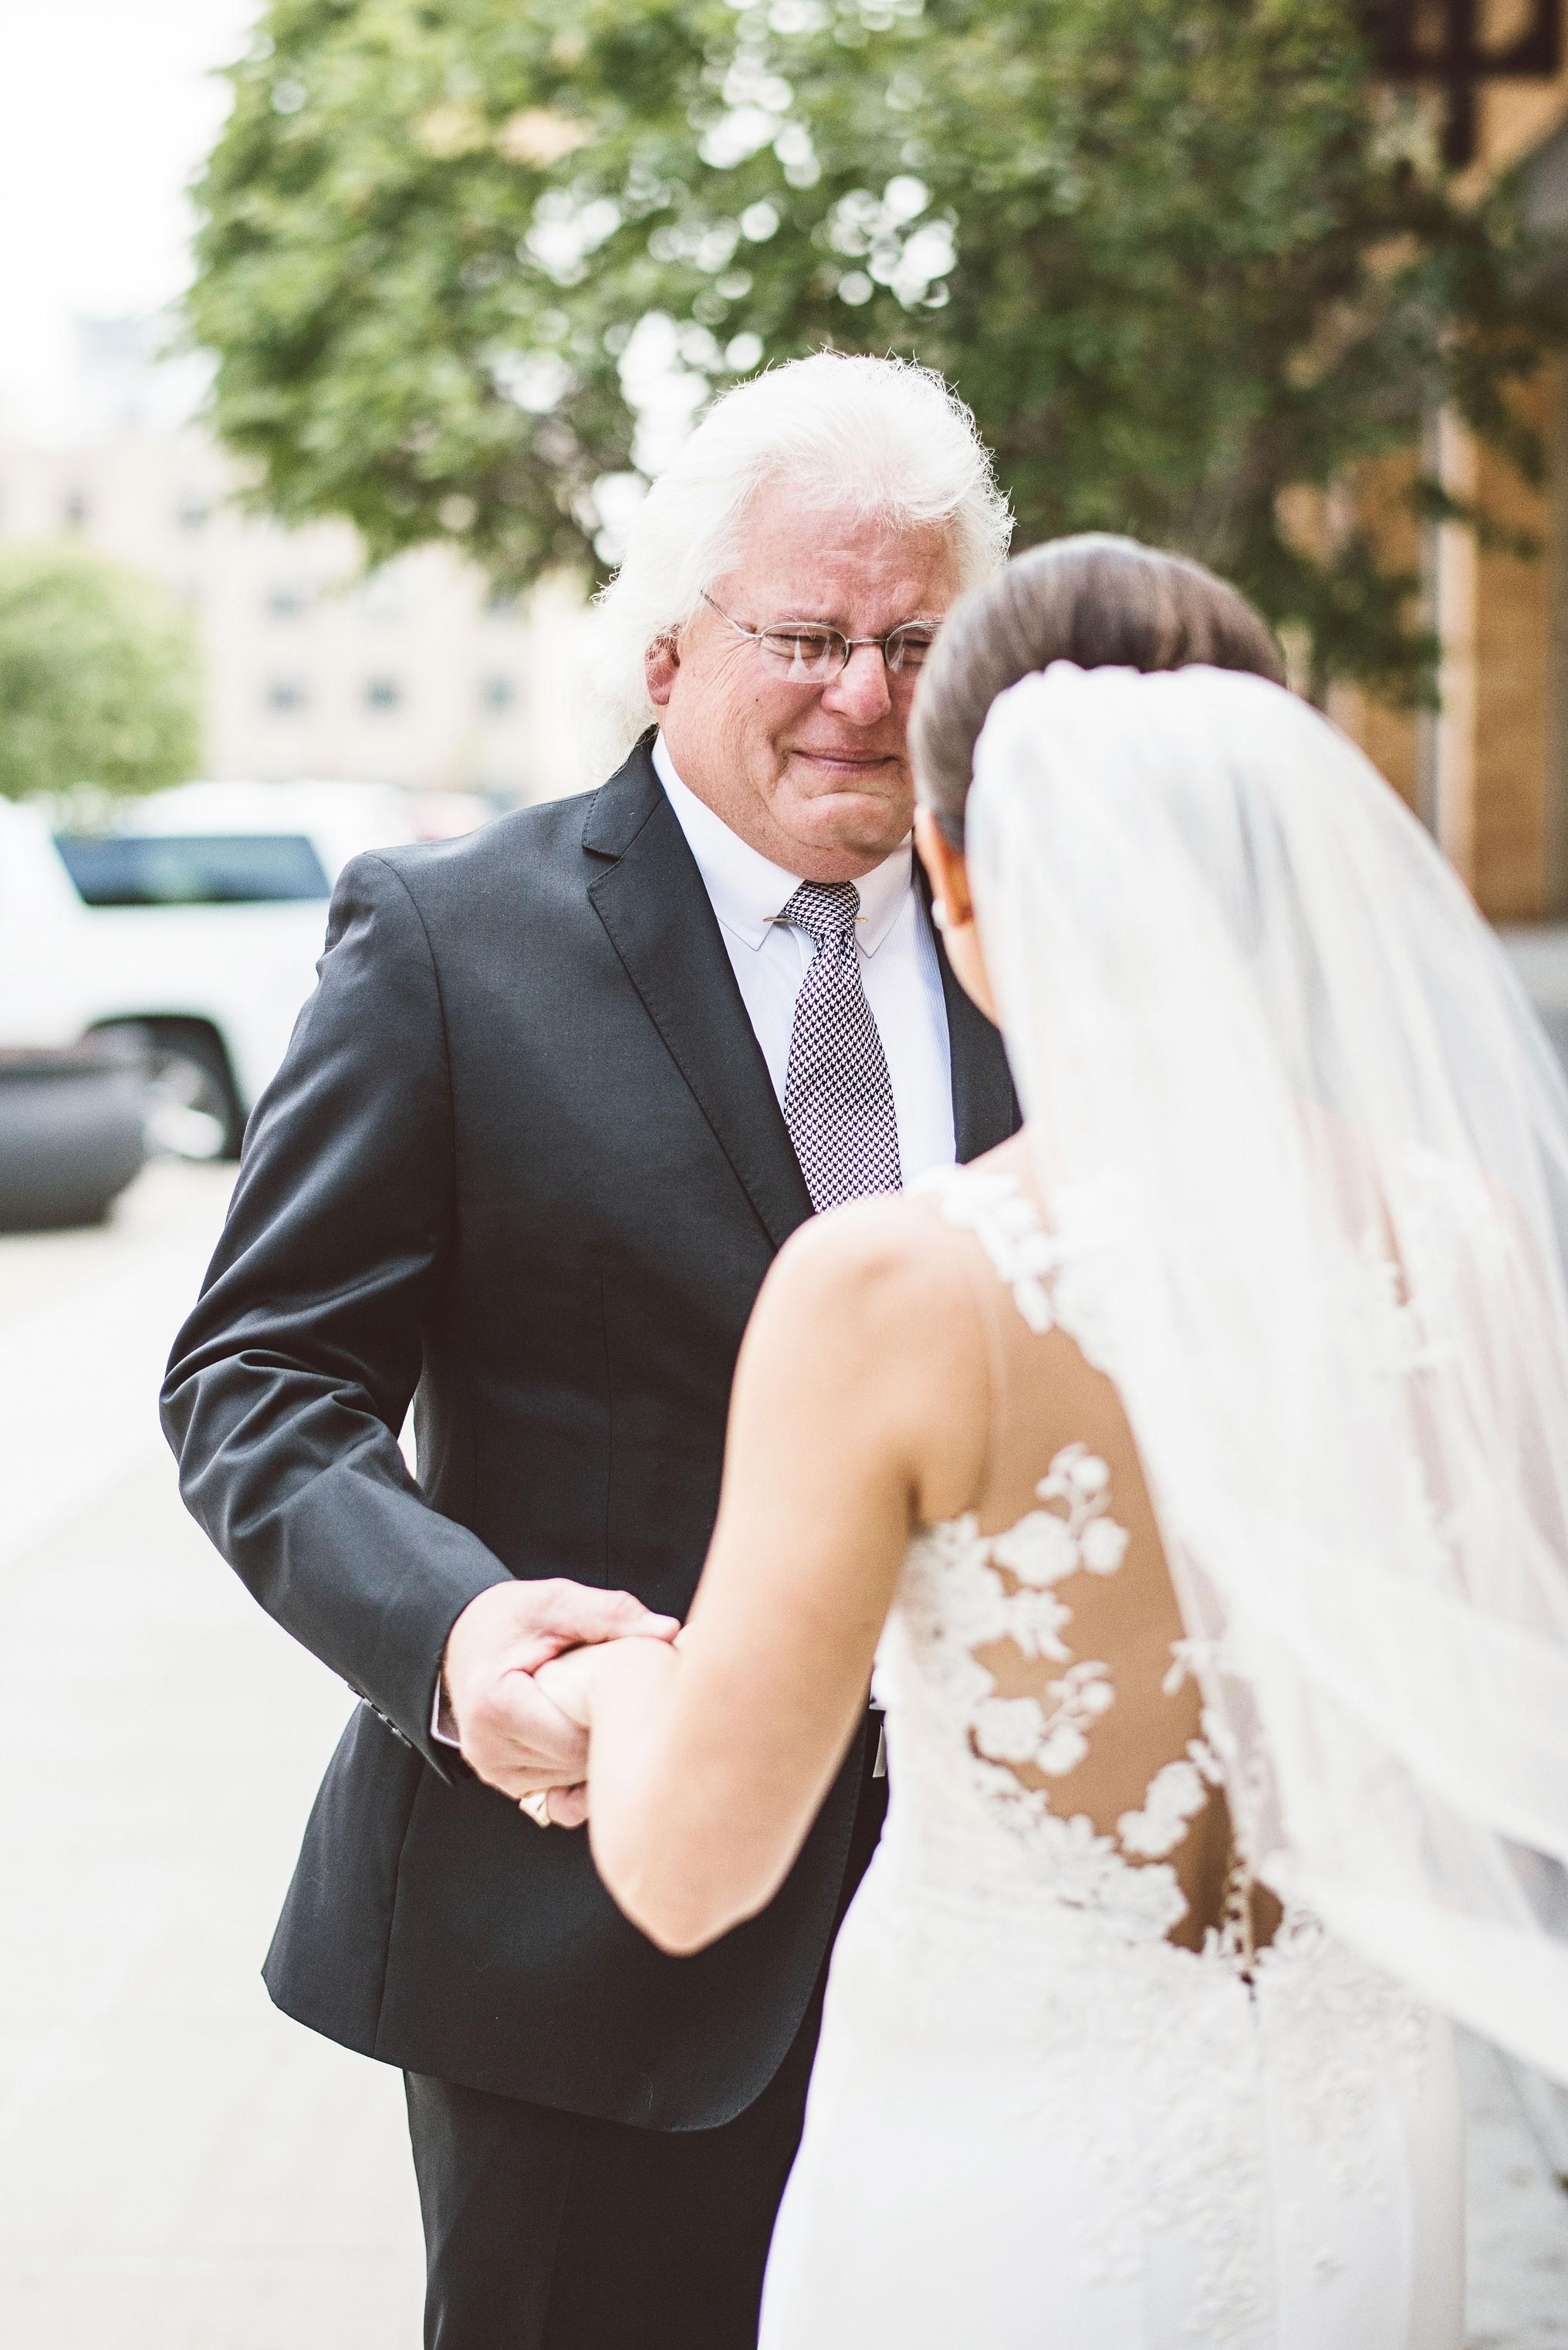 best_wedding_photography_2017_by_lucas_botz_photography_229.jpg